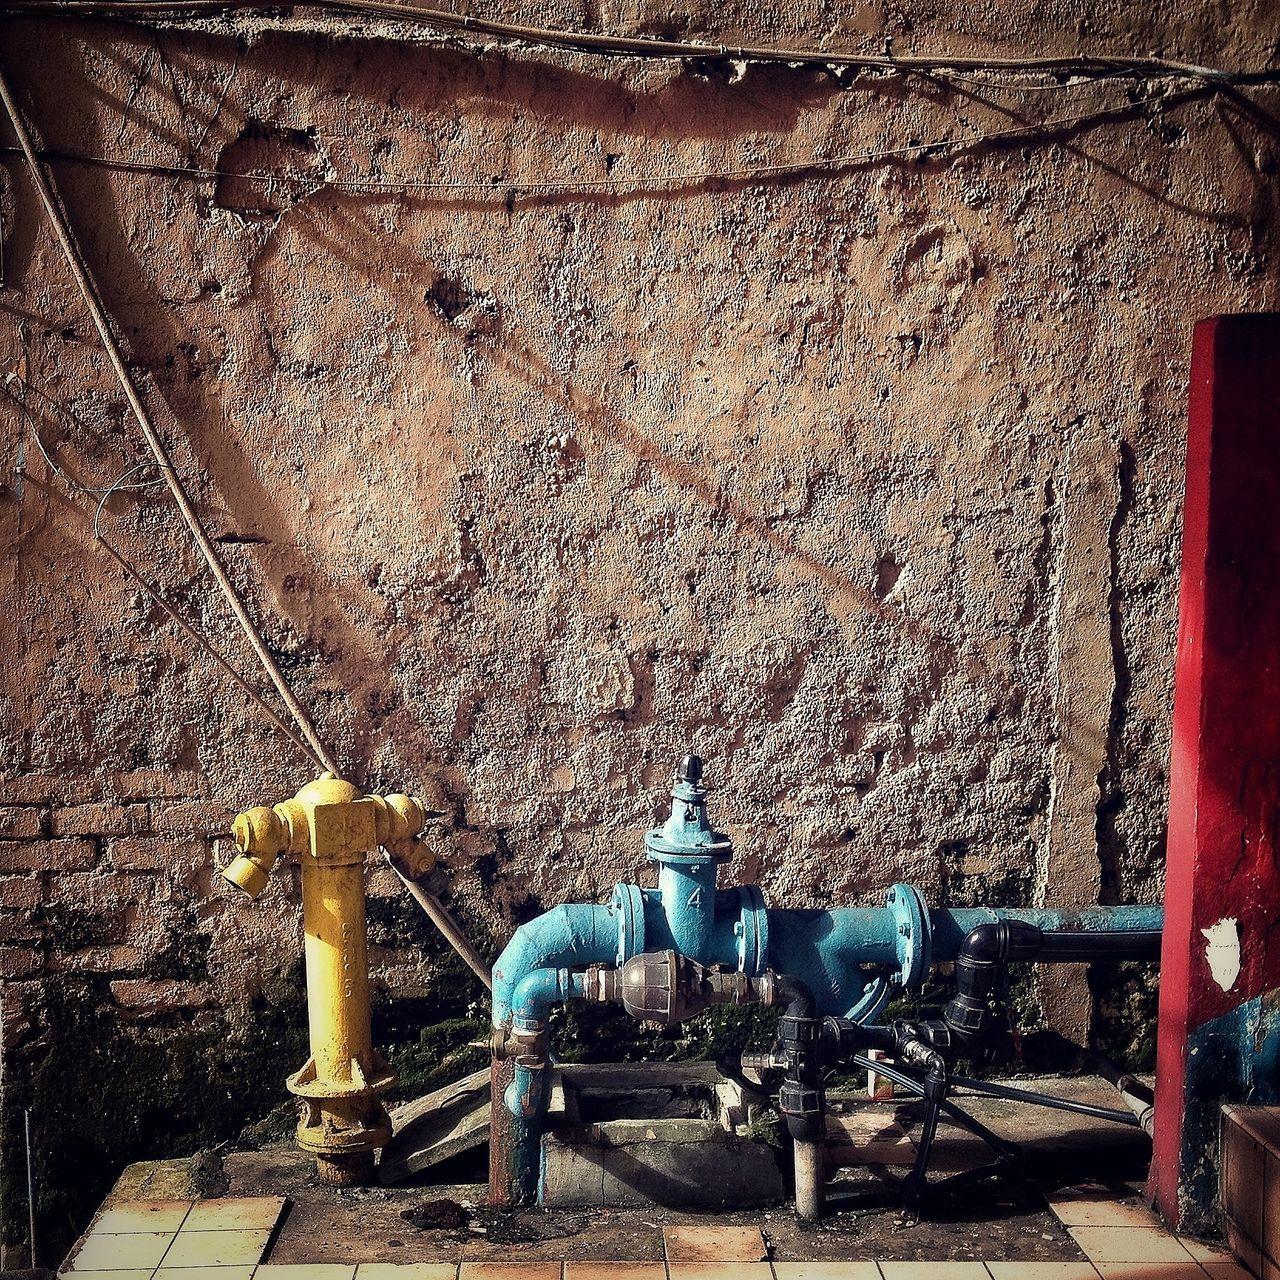 plumbing systems. Plumbing System Johor Bahru Streetphotography